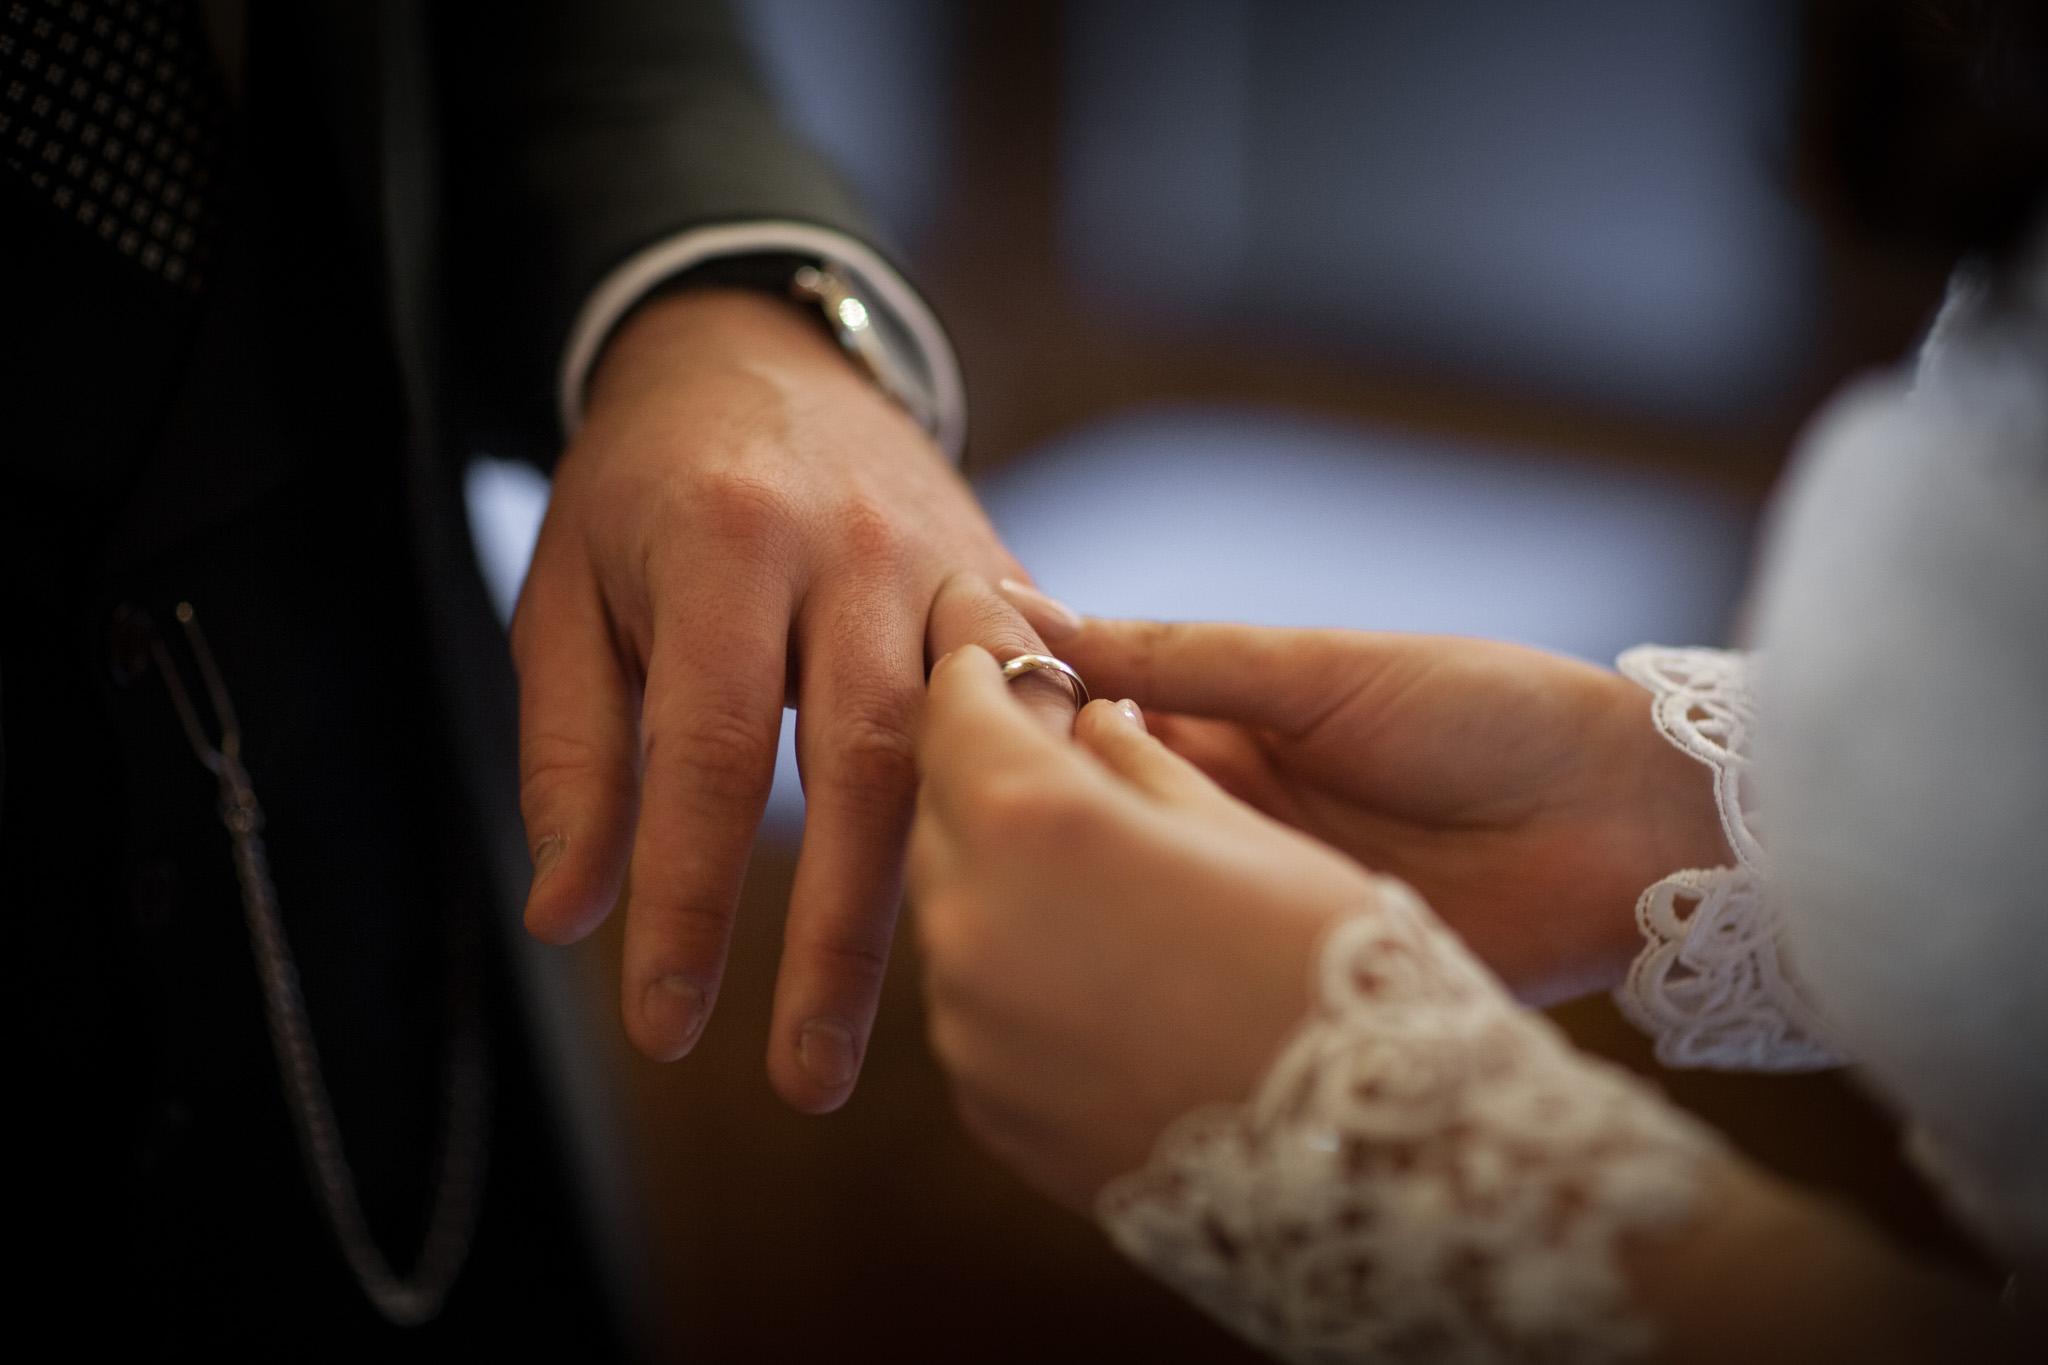 Mark_Barnes_Northern_Ireland_wedding_photographer_Harveys_Point_Donegall_Wedding_photography-Adam&Gemma-26.jpg